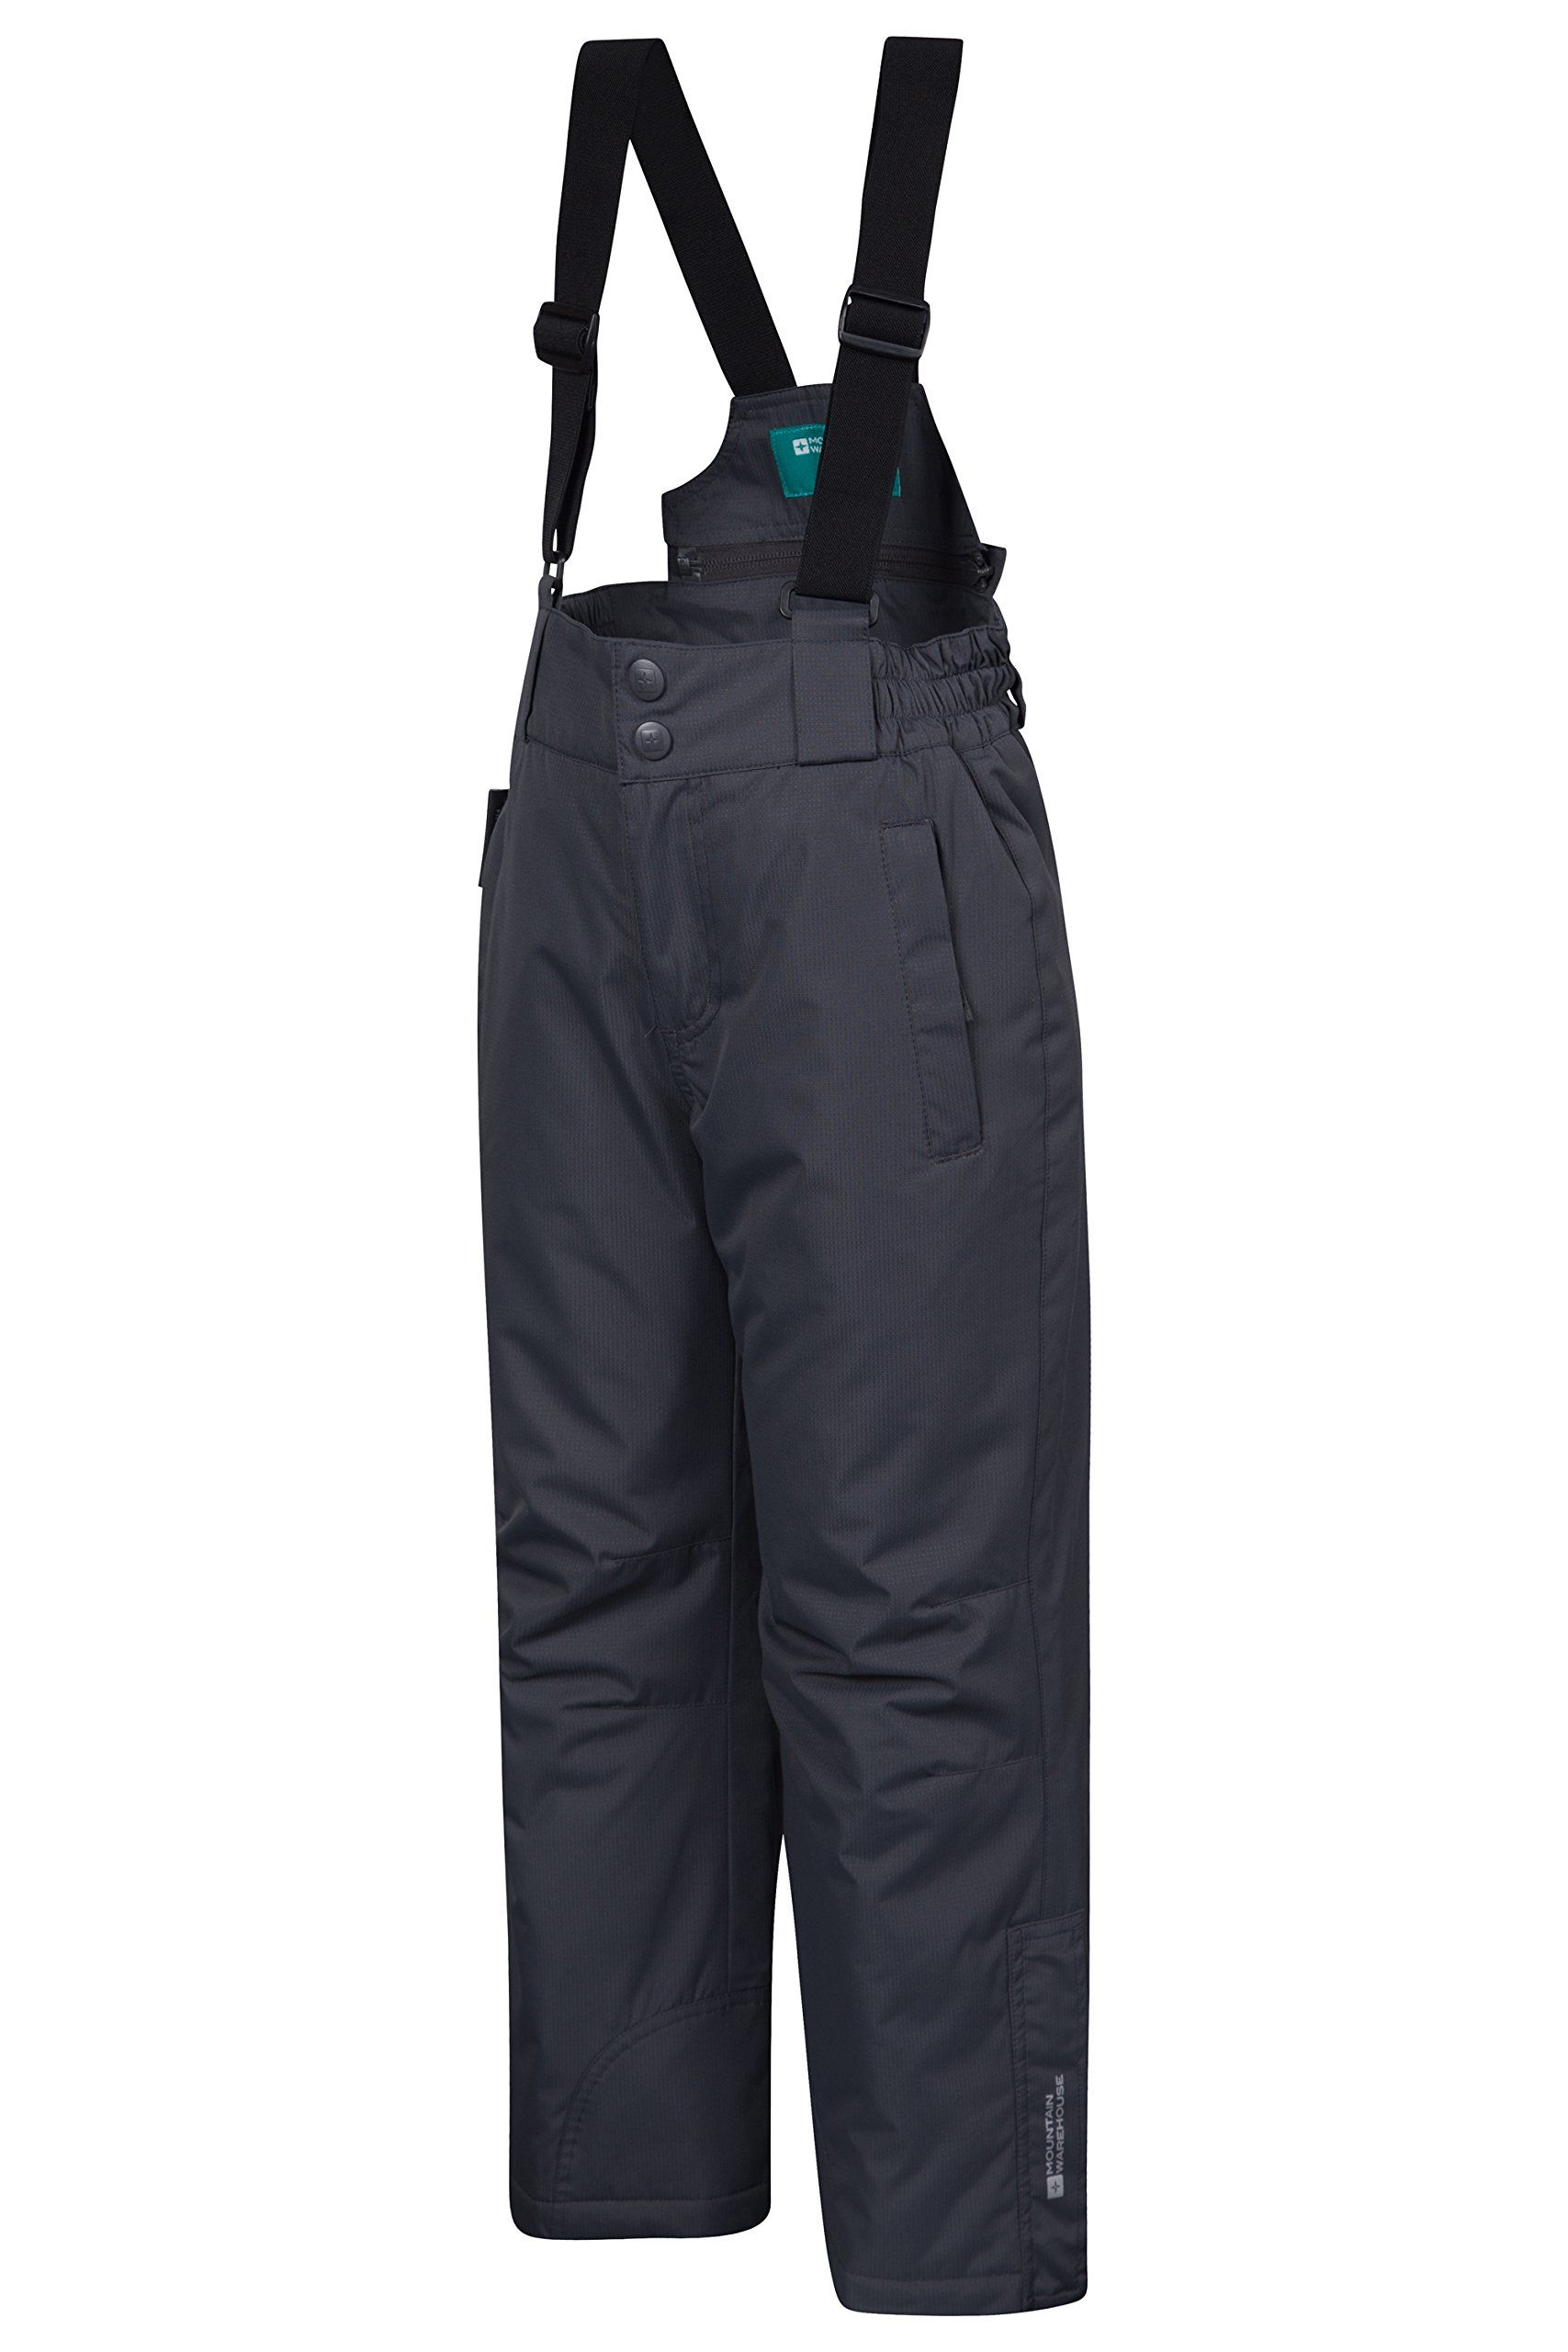 1abfec386 Mountain Warehouse Raptor Kids Snow Pants Dark Grey 9-10 years. Snowproof -  Treated